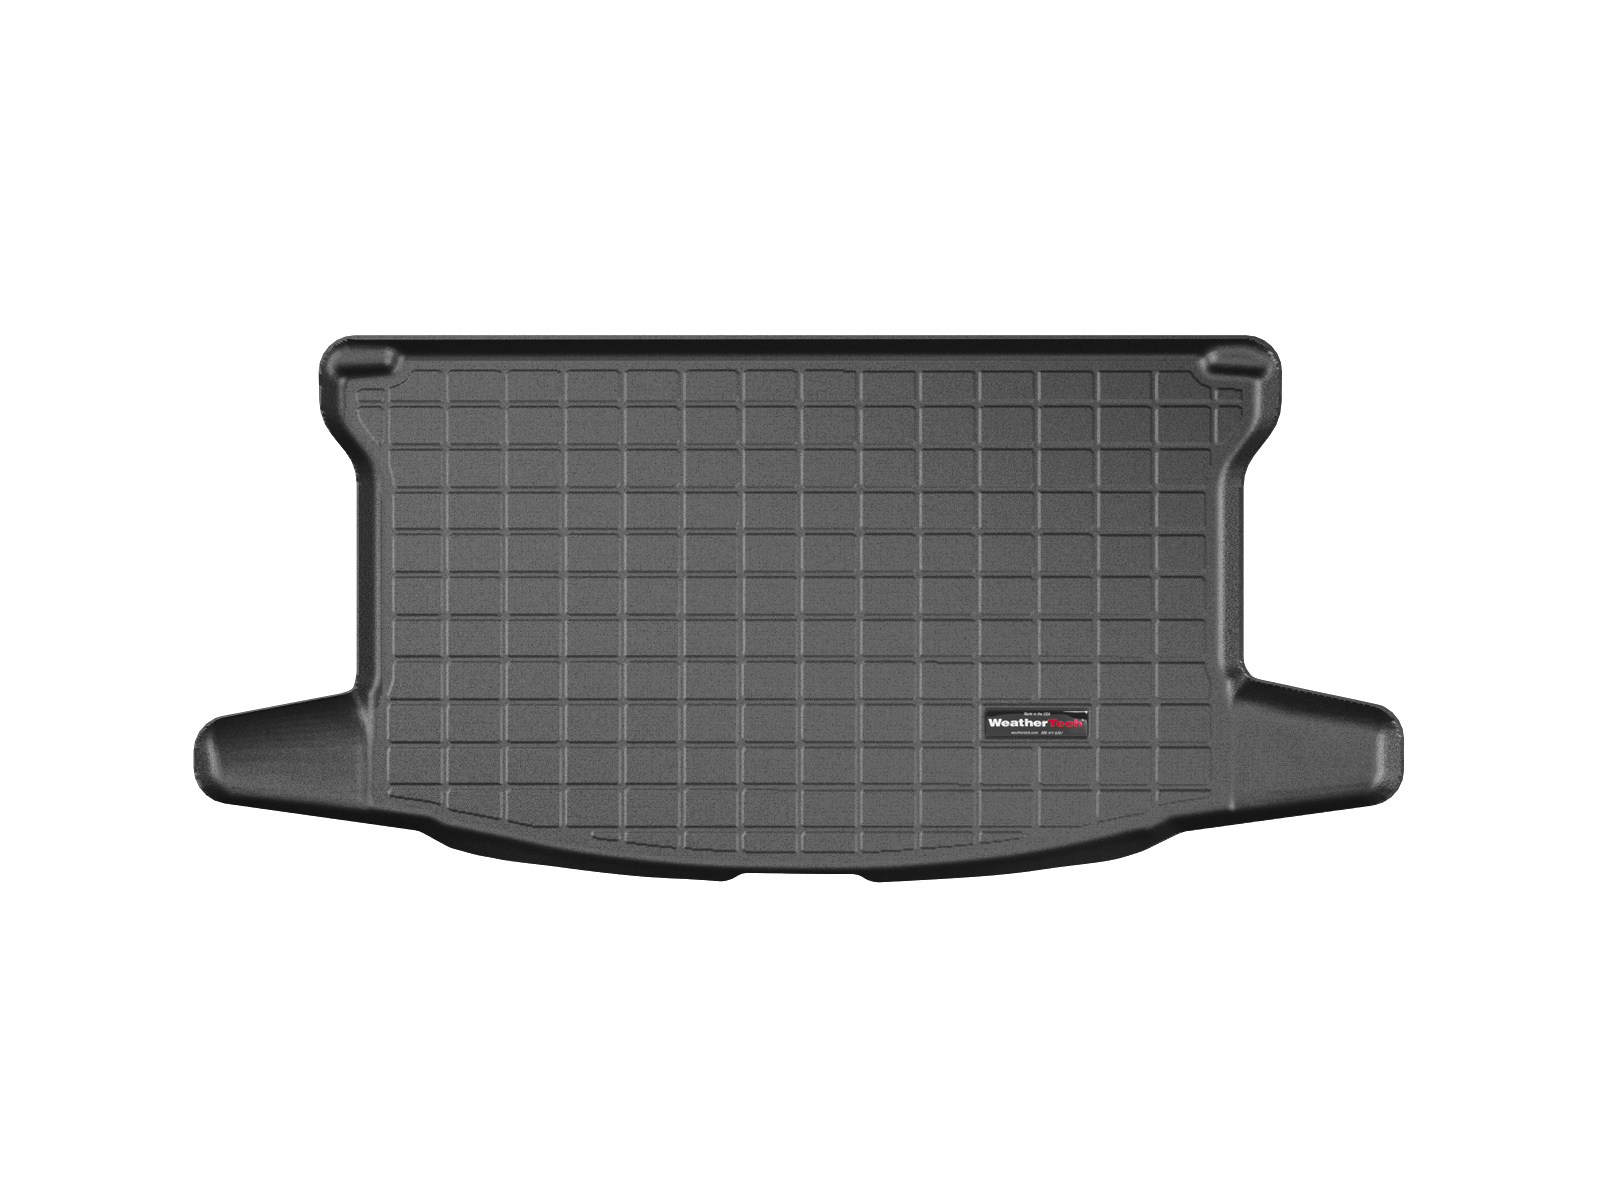 Toyota Yaris 2012>2017 Vasca baule WeatherTech bagagliaio nero *1315*